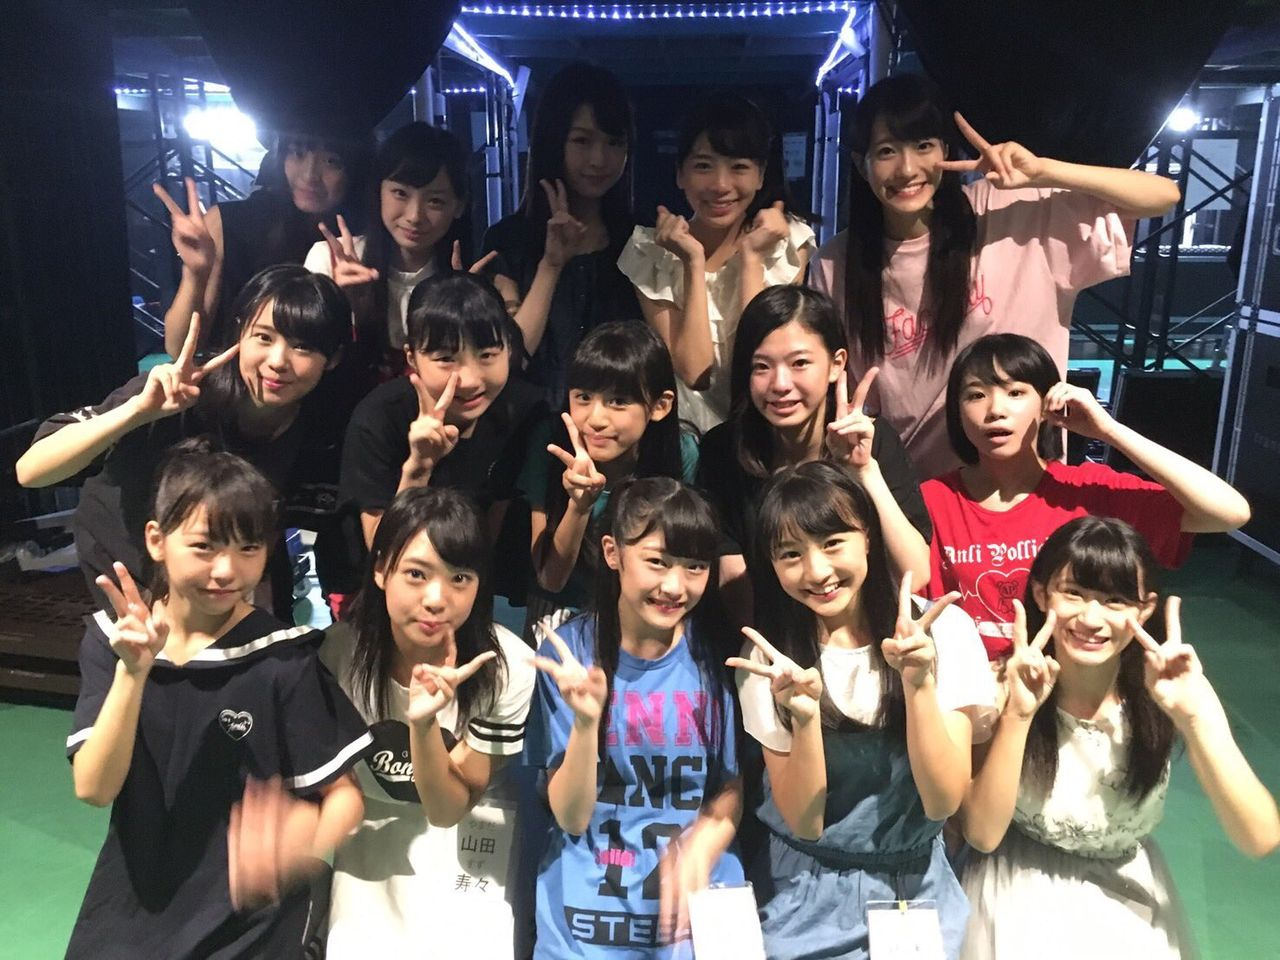 【NMB48 7周年】研究生全員昇格キタ━━━━(゚∀゚)━━━━!!